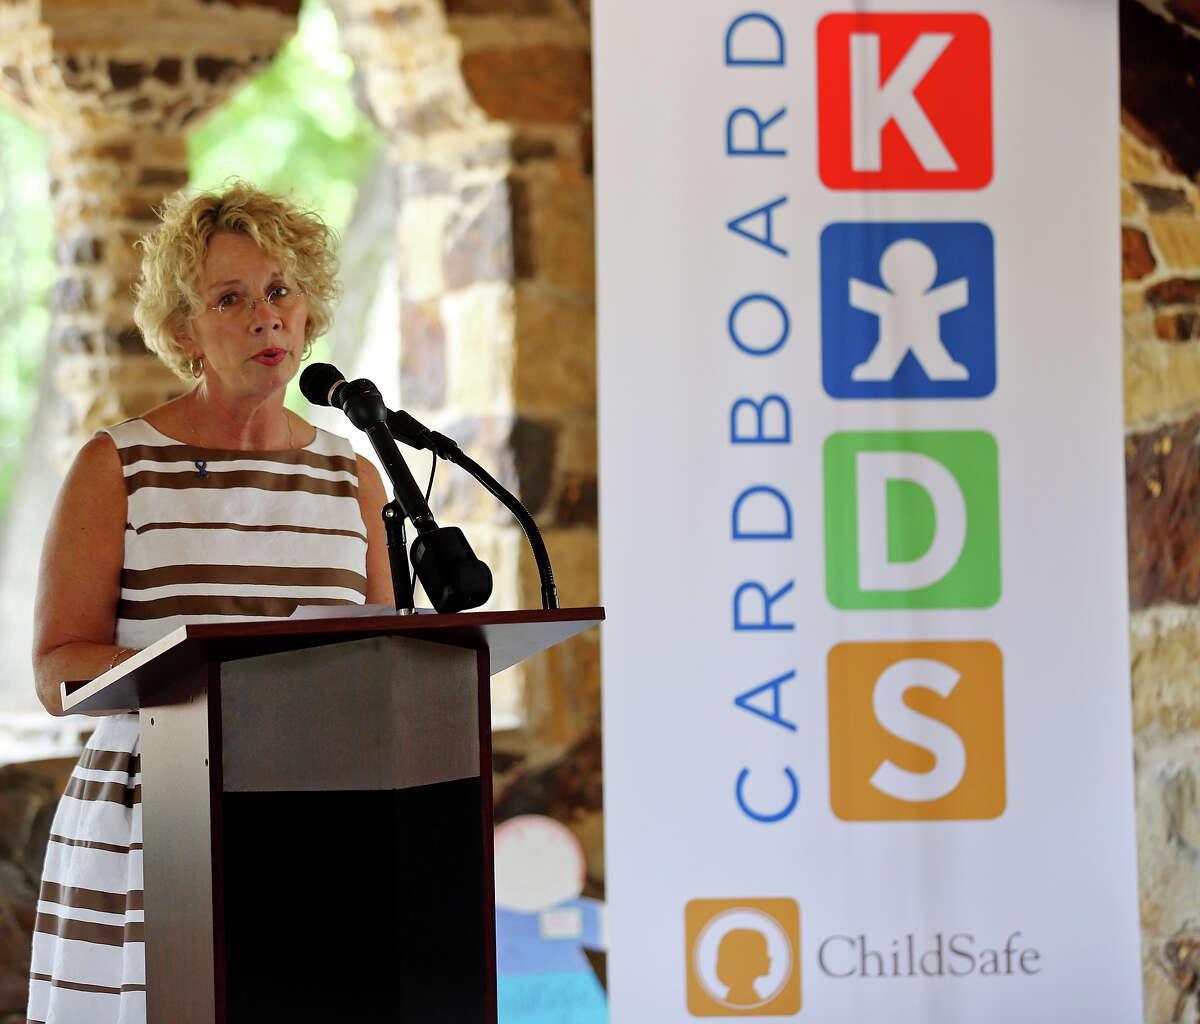 ChildSafe President and CEO Kim Abernethy speaks during a press conference held Thursday April 9, 2015 at the Joske Pavilion in Brackenridge Park, where ChildSafe's Cardboard Kids were displayed. April is National Child Abuse Prevention month.